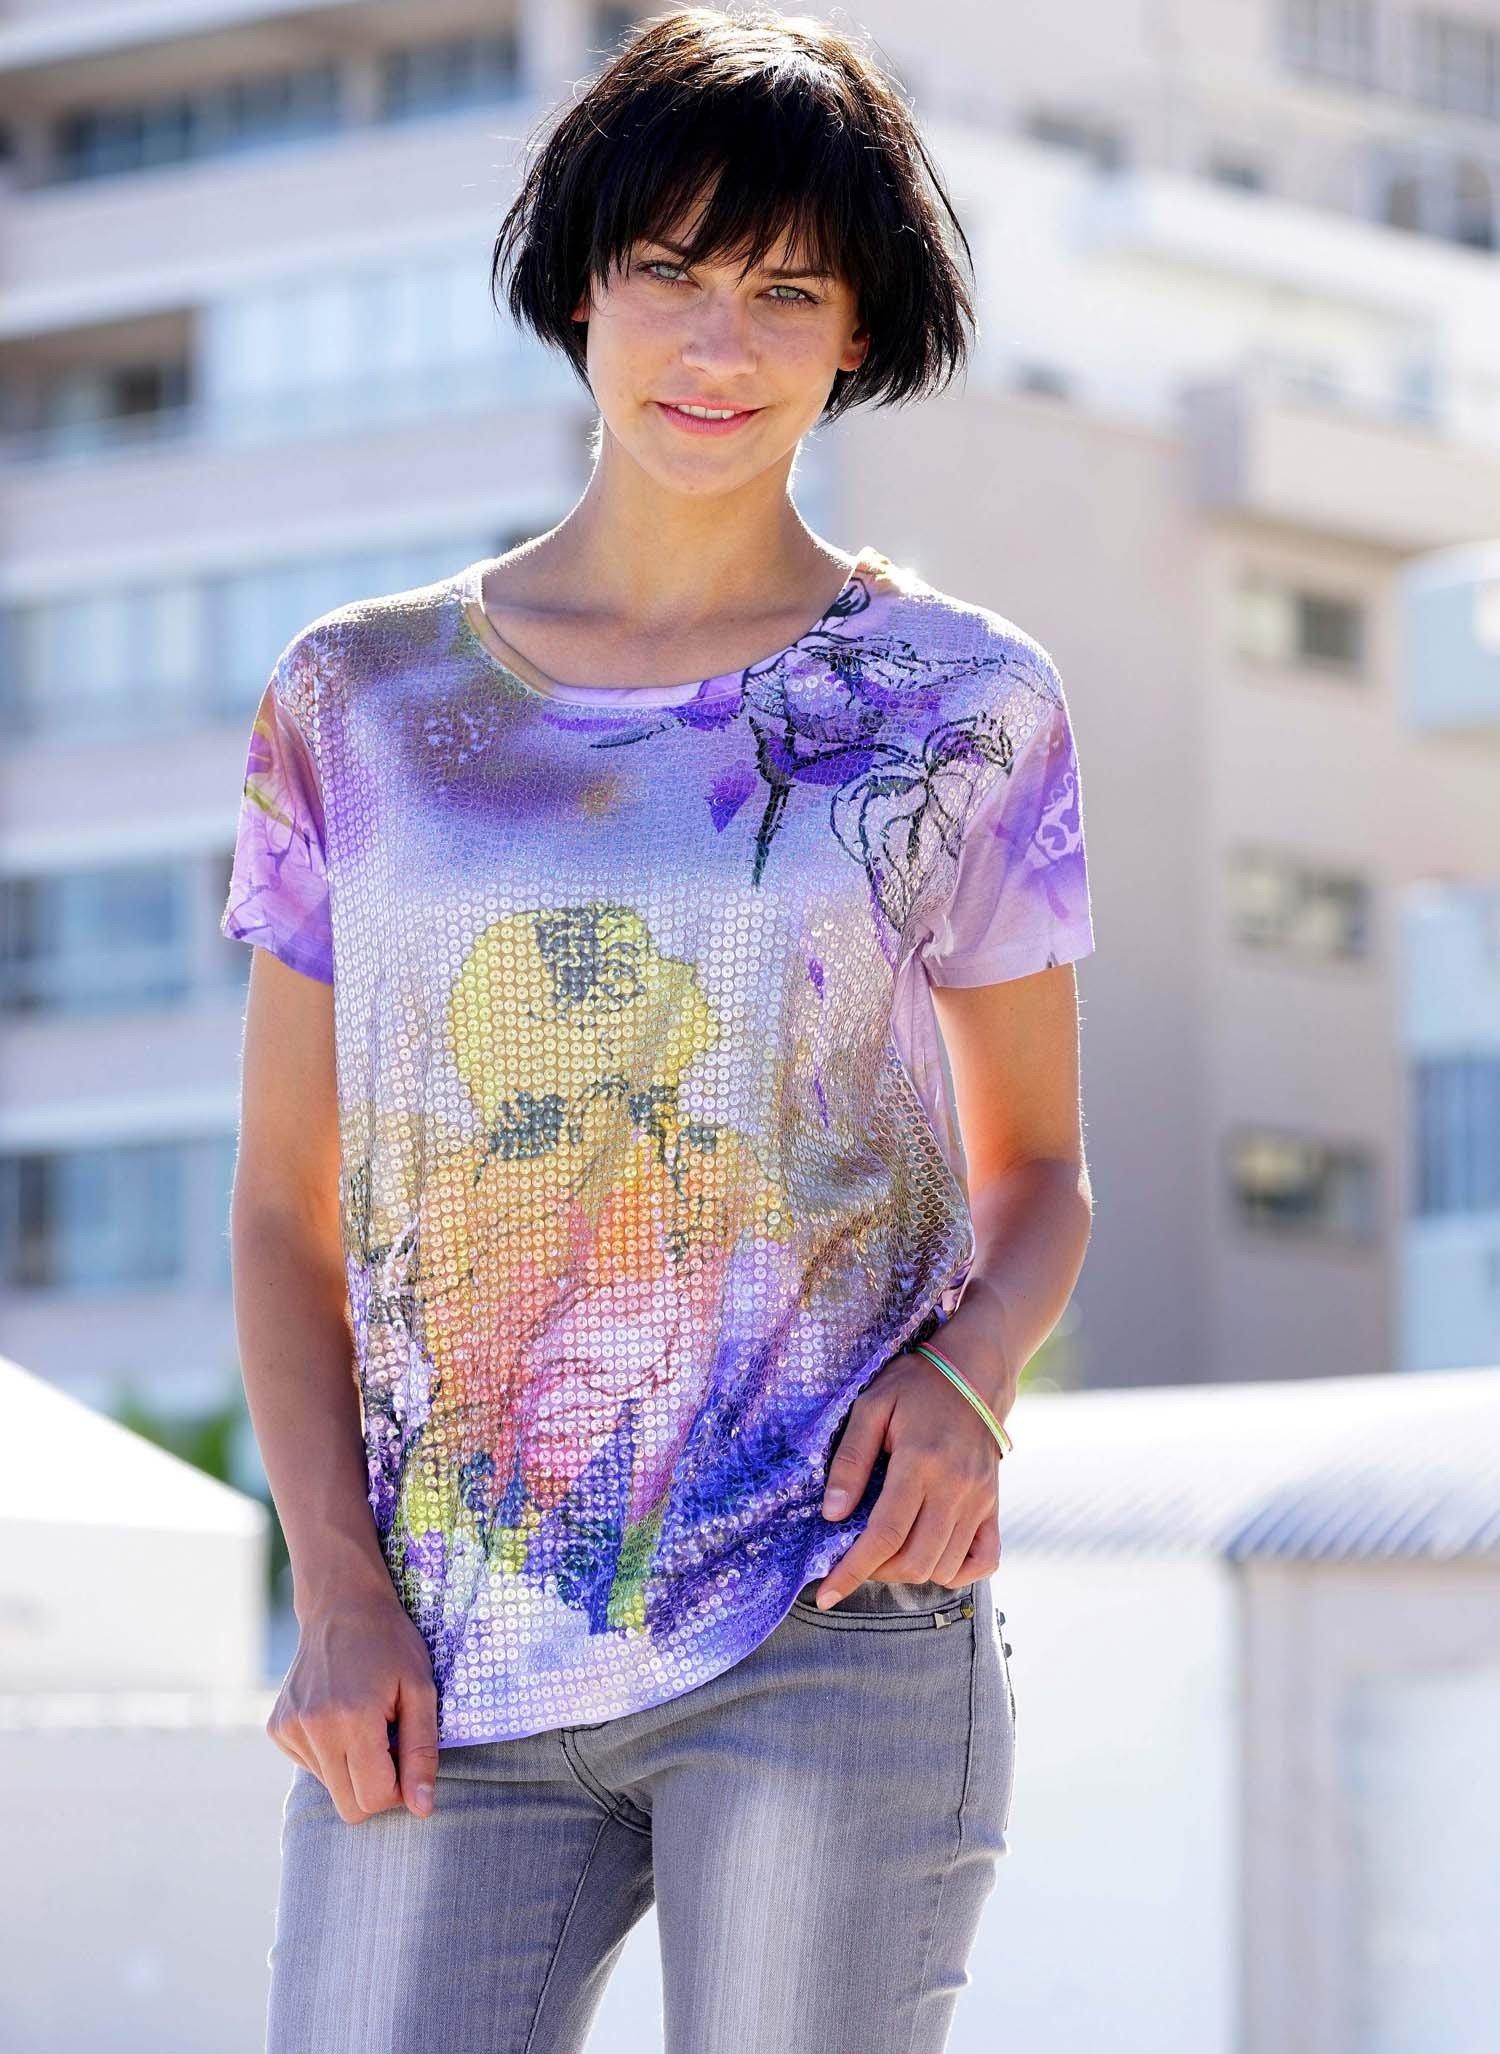 D-KA-Shirt,Girl/Floral.violett L 036 - 1 - Ronja.ch